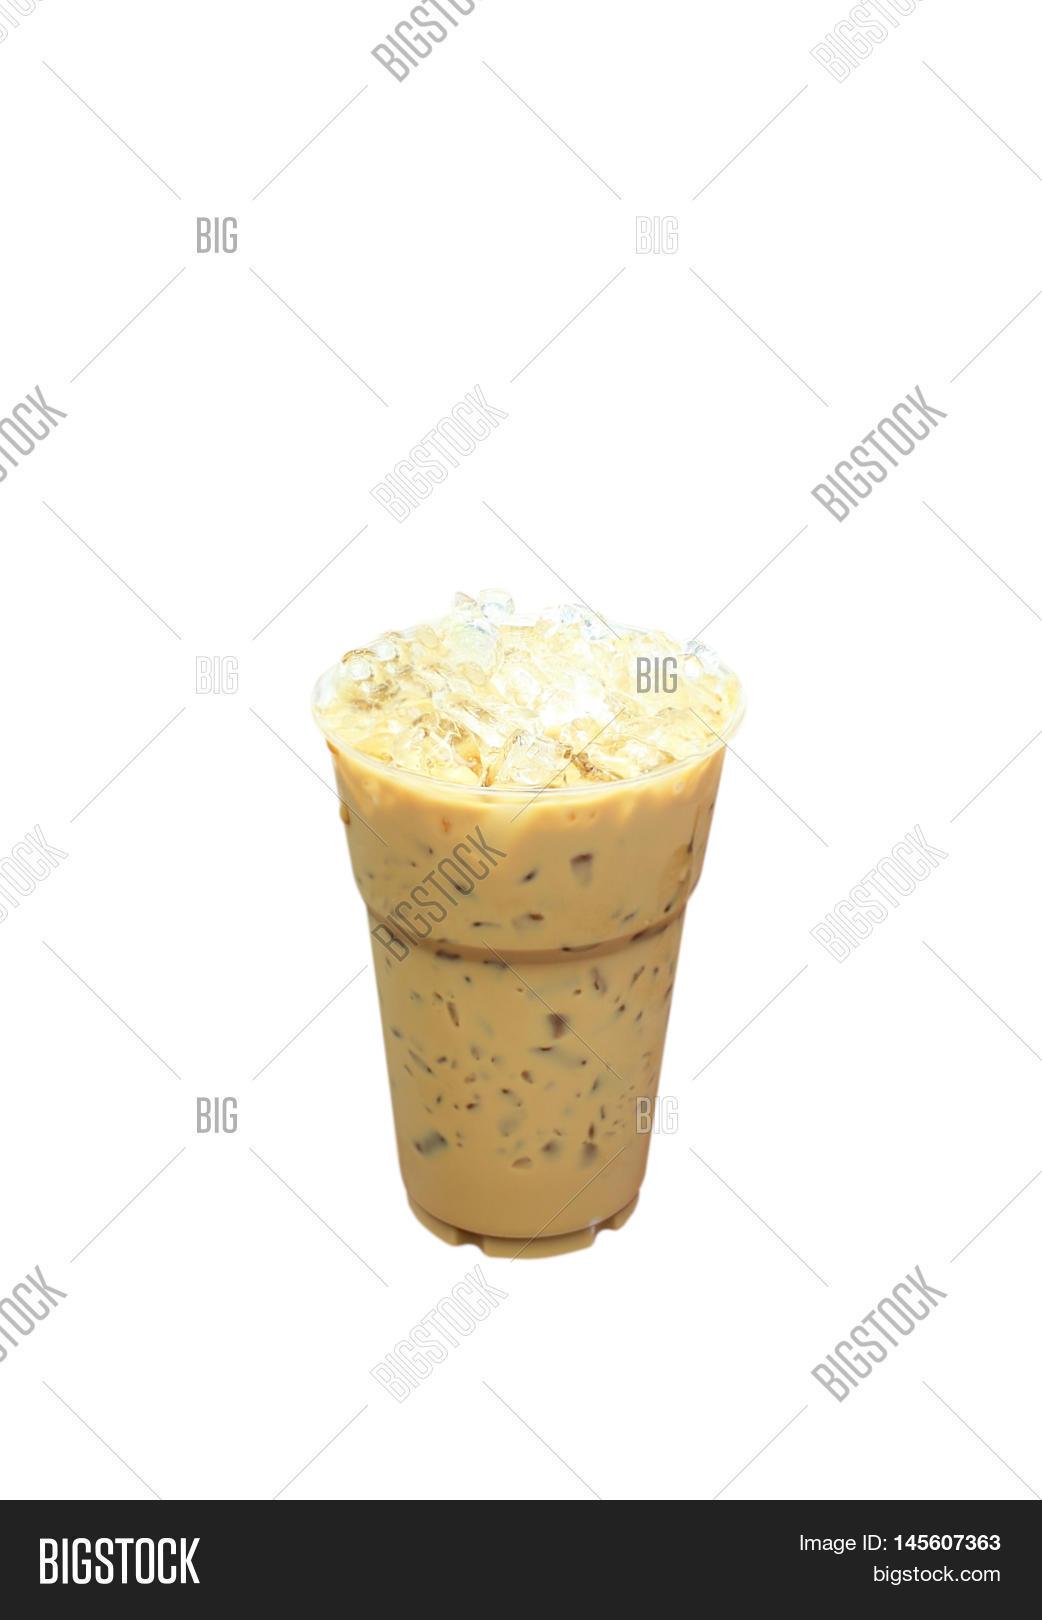 Iced Coffee Plastic Image Photo Free Trial Bigstock